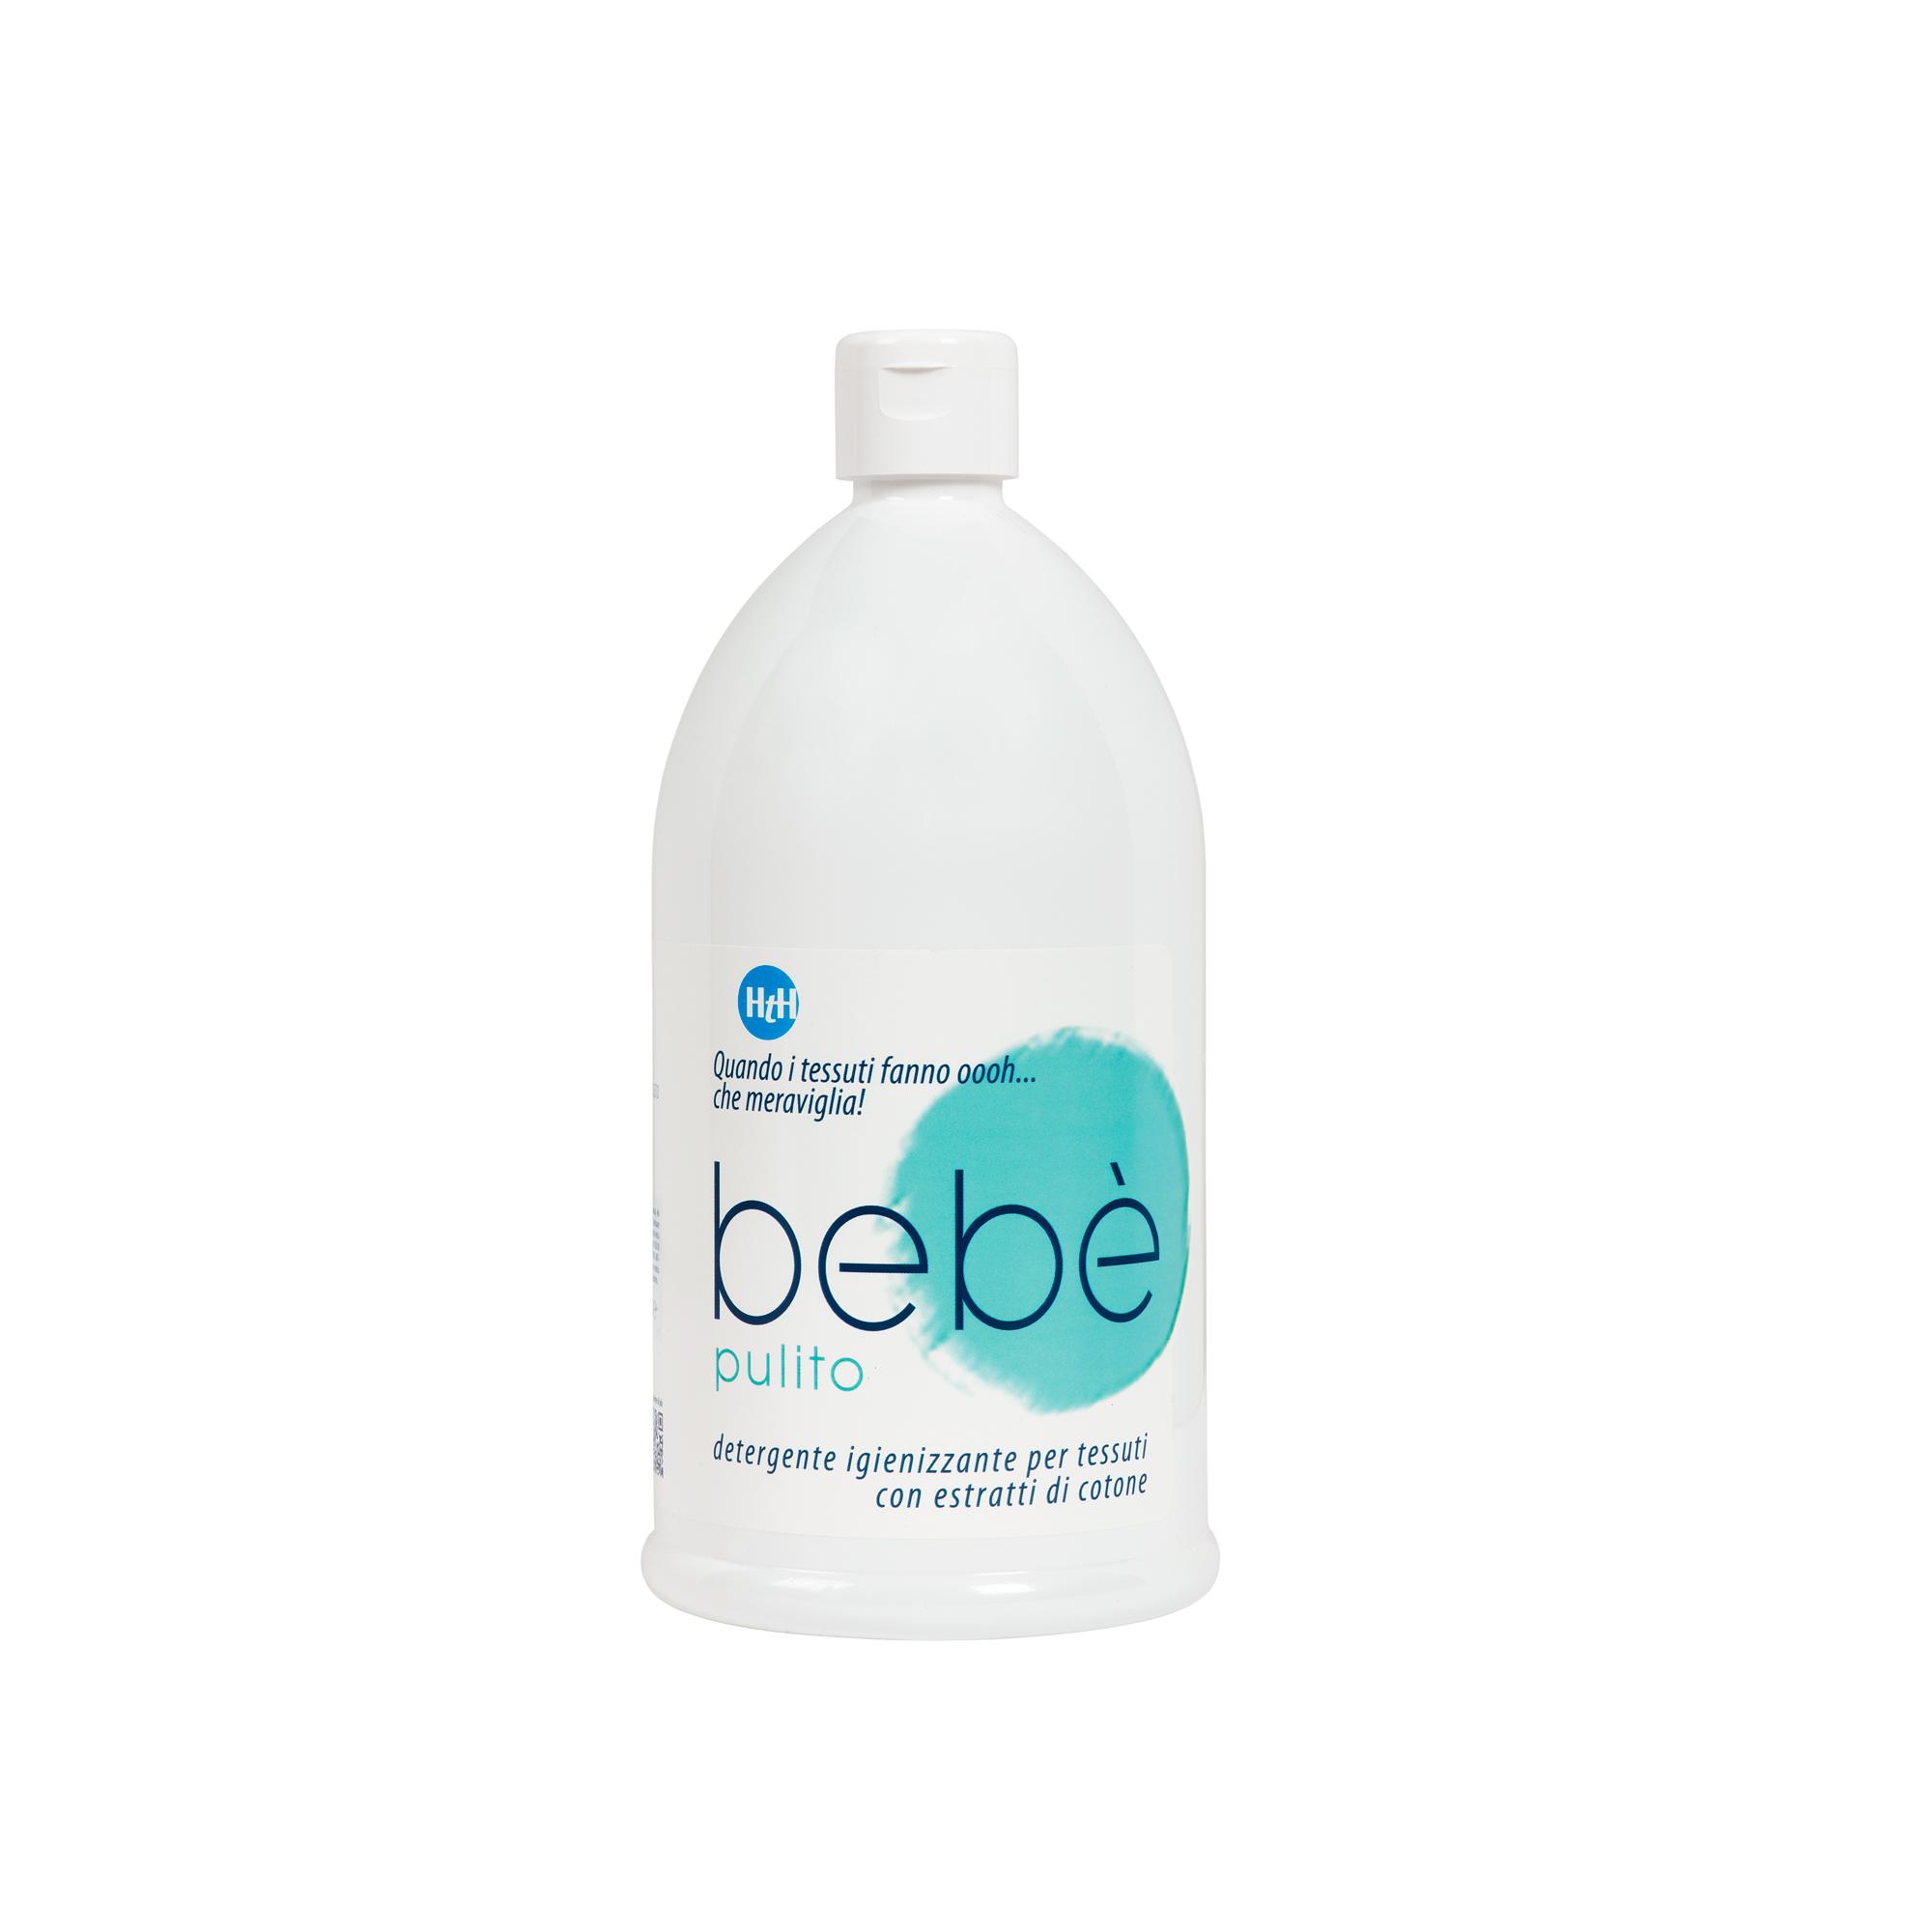 Bebe-pulito